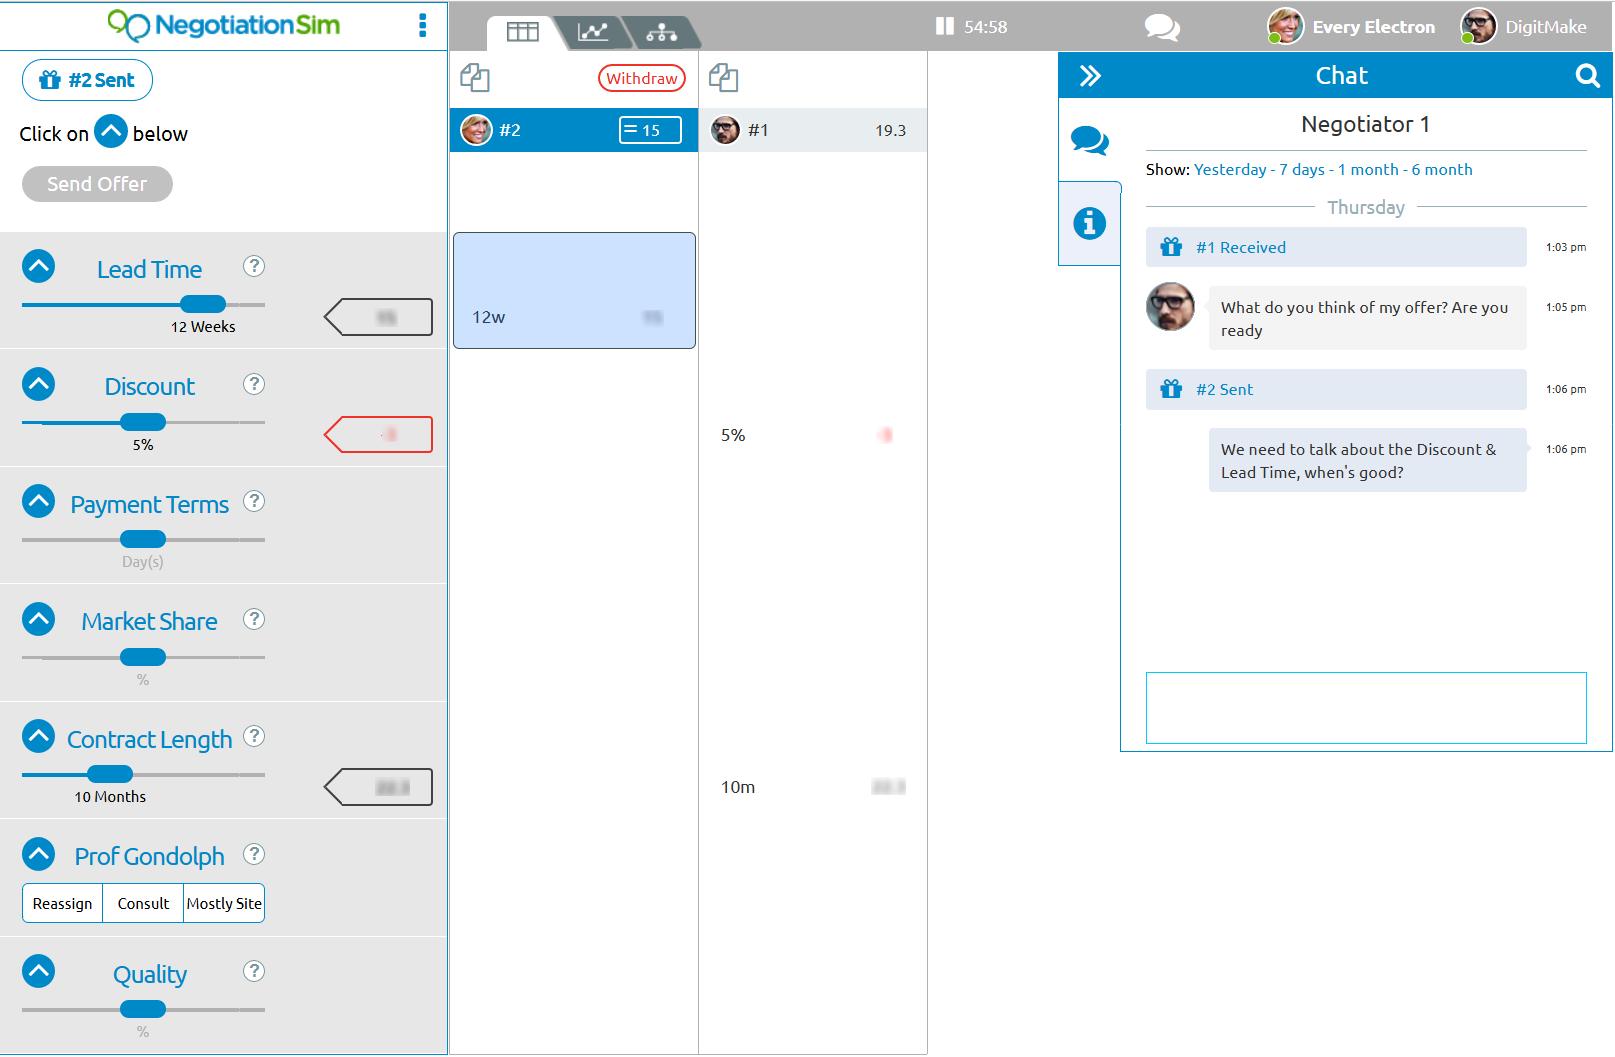 Negotiation Sim Screenshot